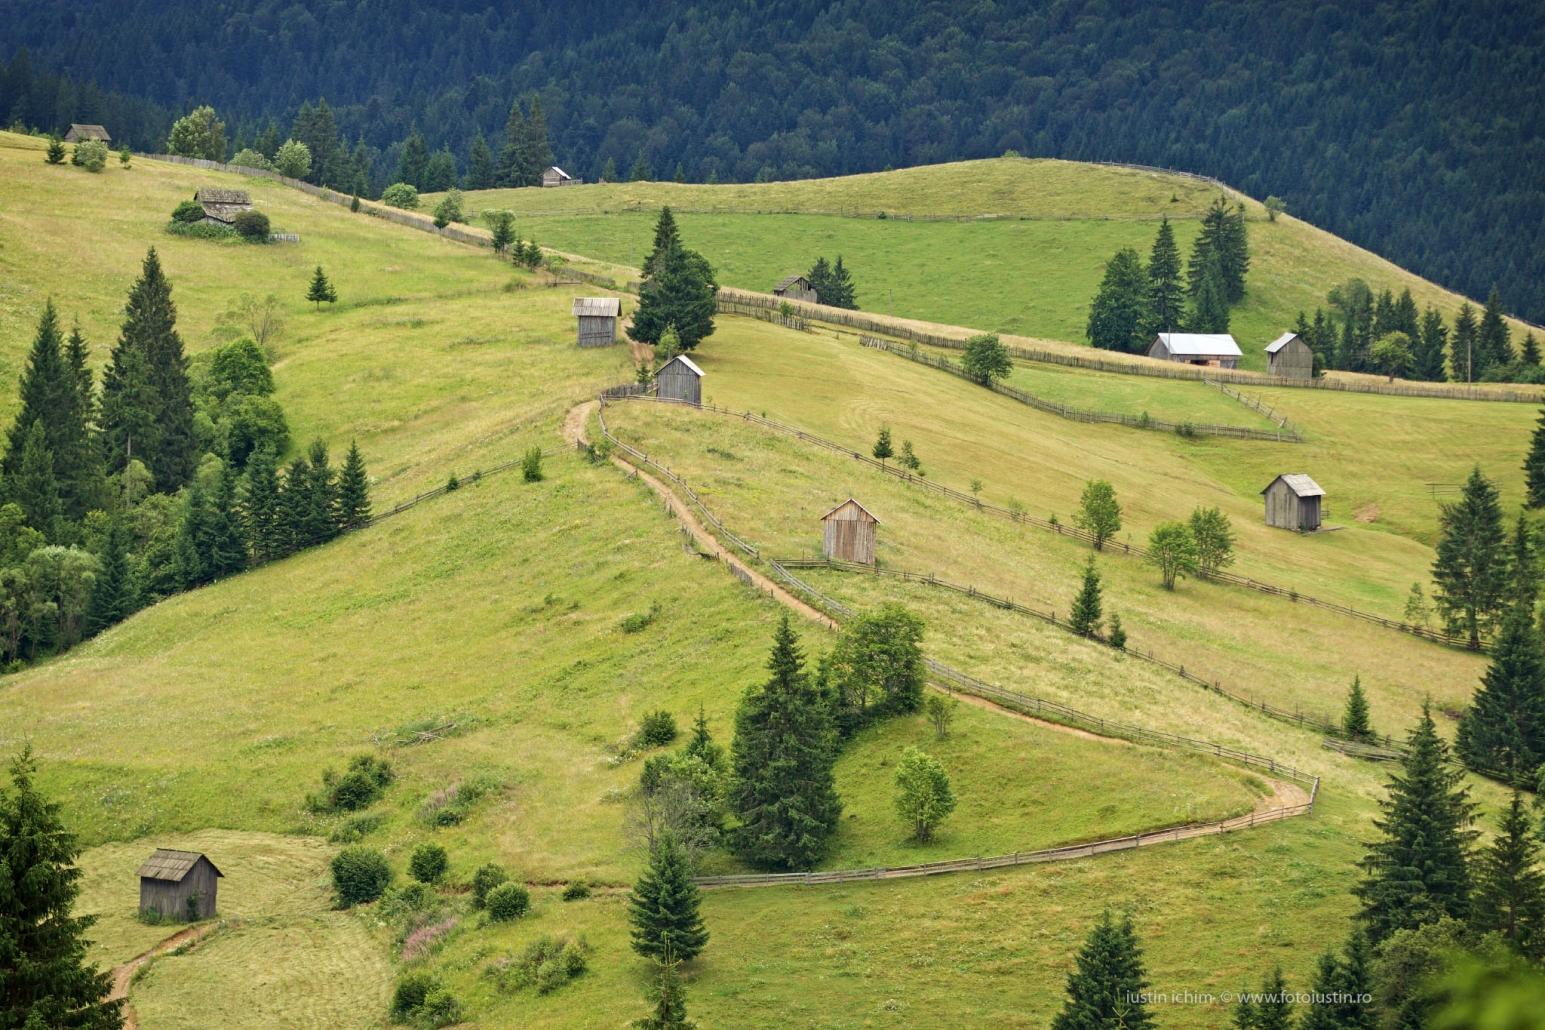 Peisaj pitoresc din România, Bucovina